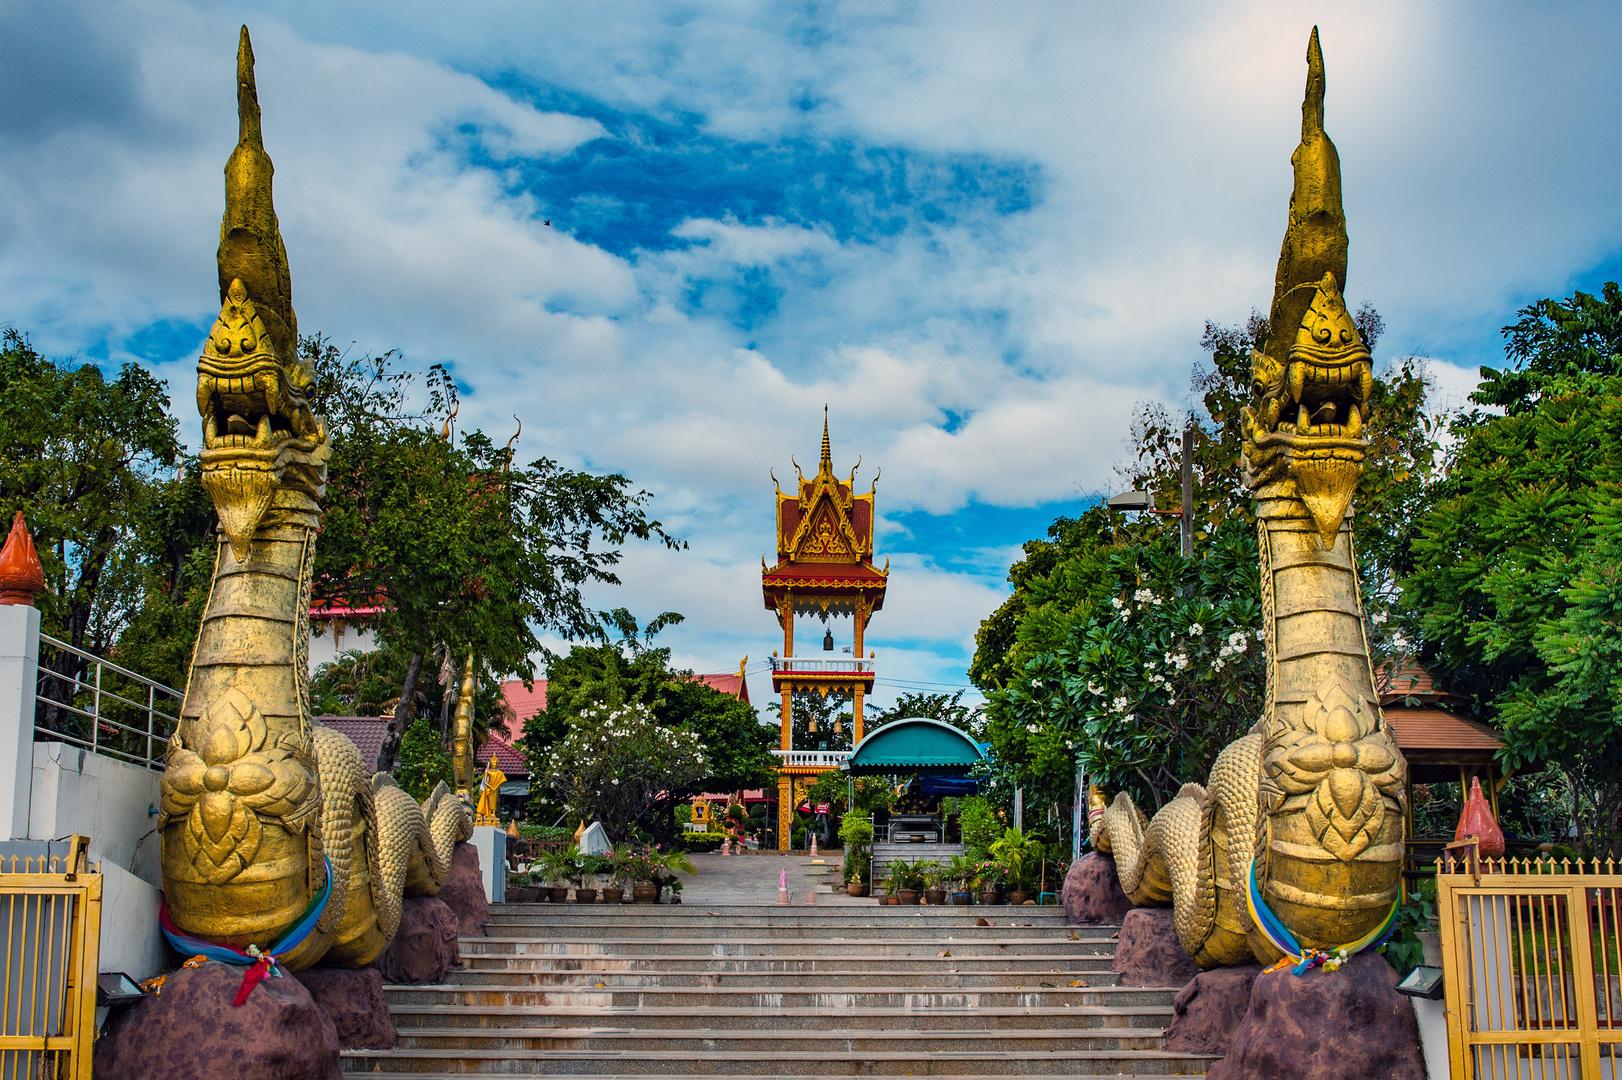 Stairways to the Wat Luang